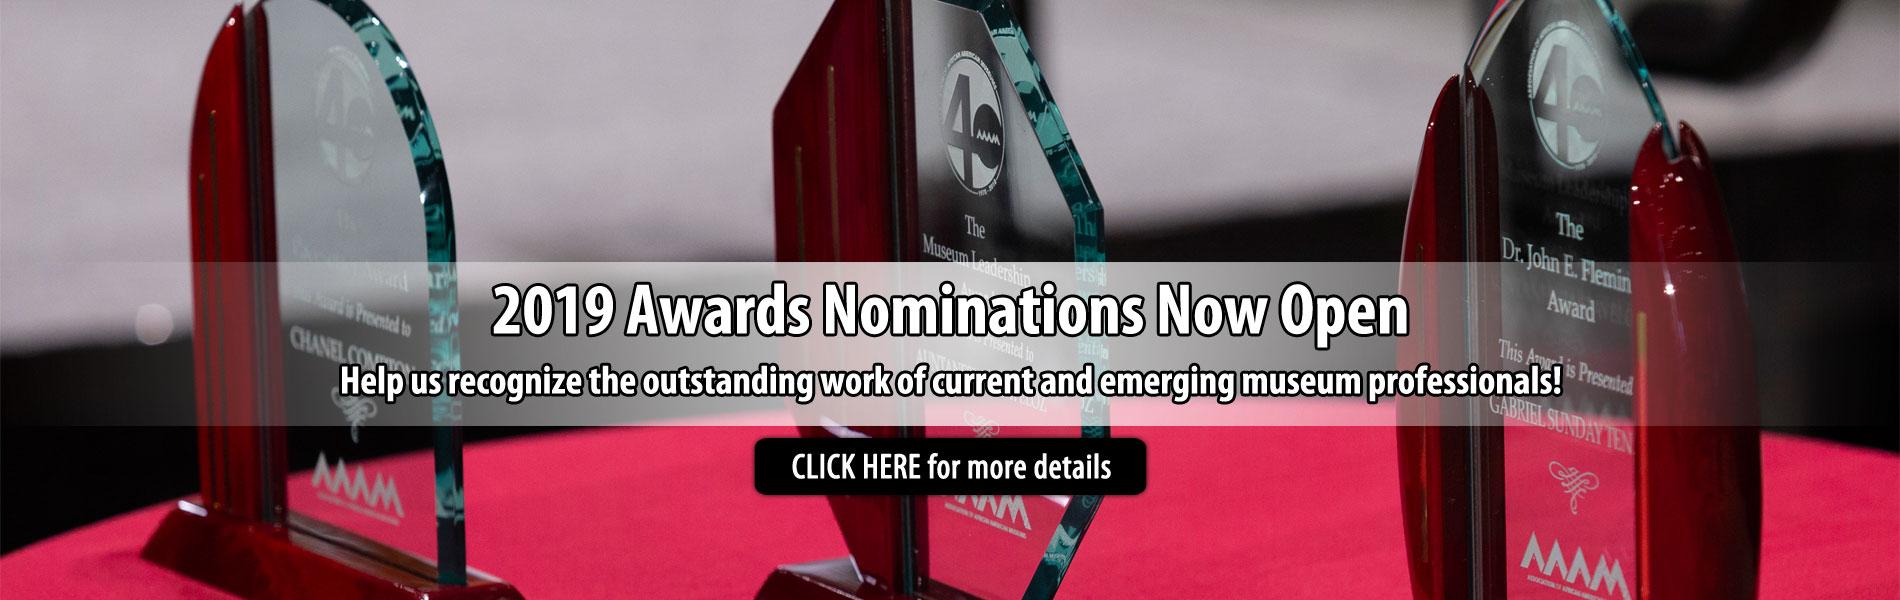 2019 Awards Nominations